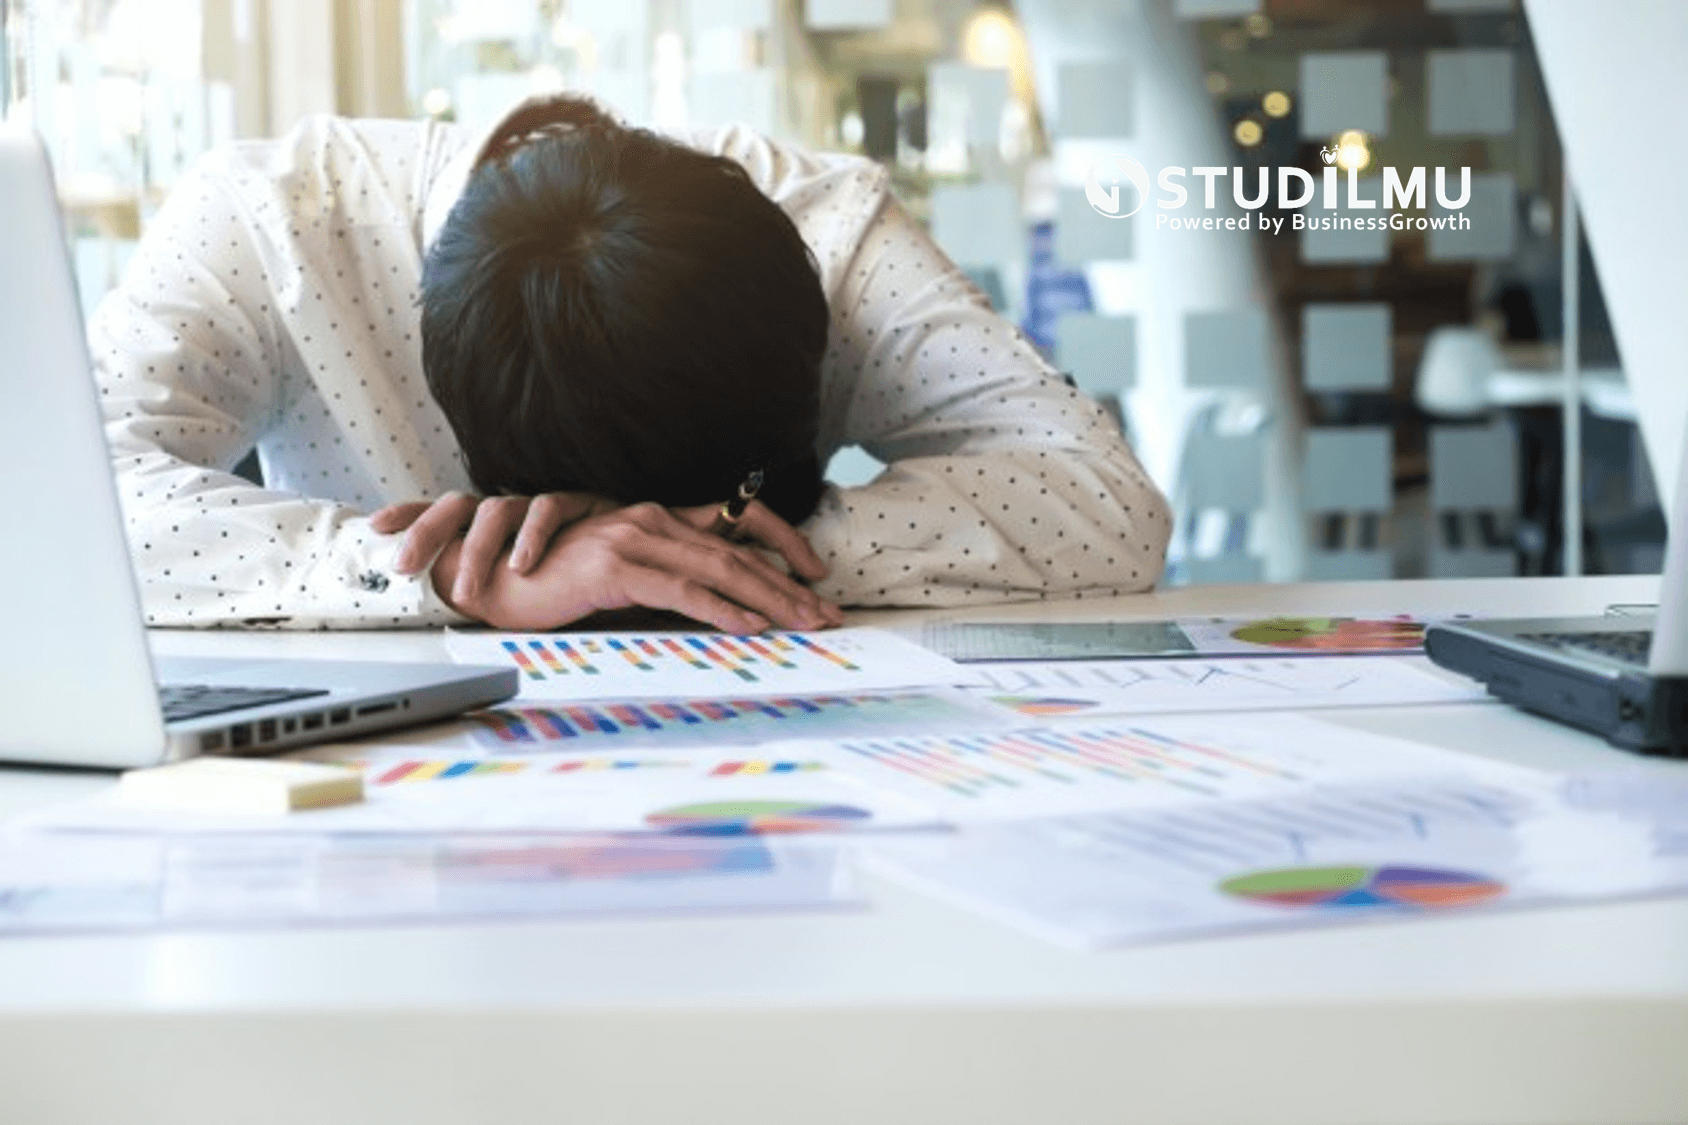 STUDILMU Career Advice - 5 Alasan Musuh Terbesar adalah Diri Sendiri